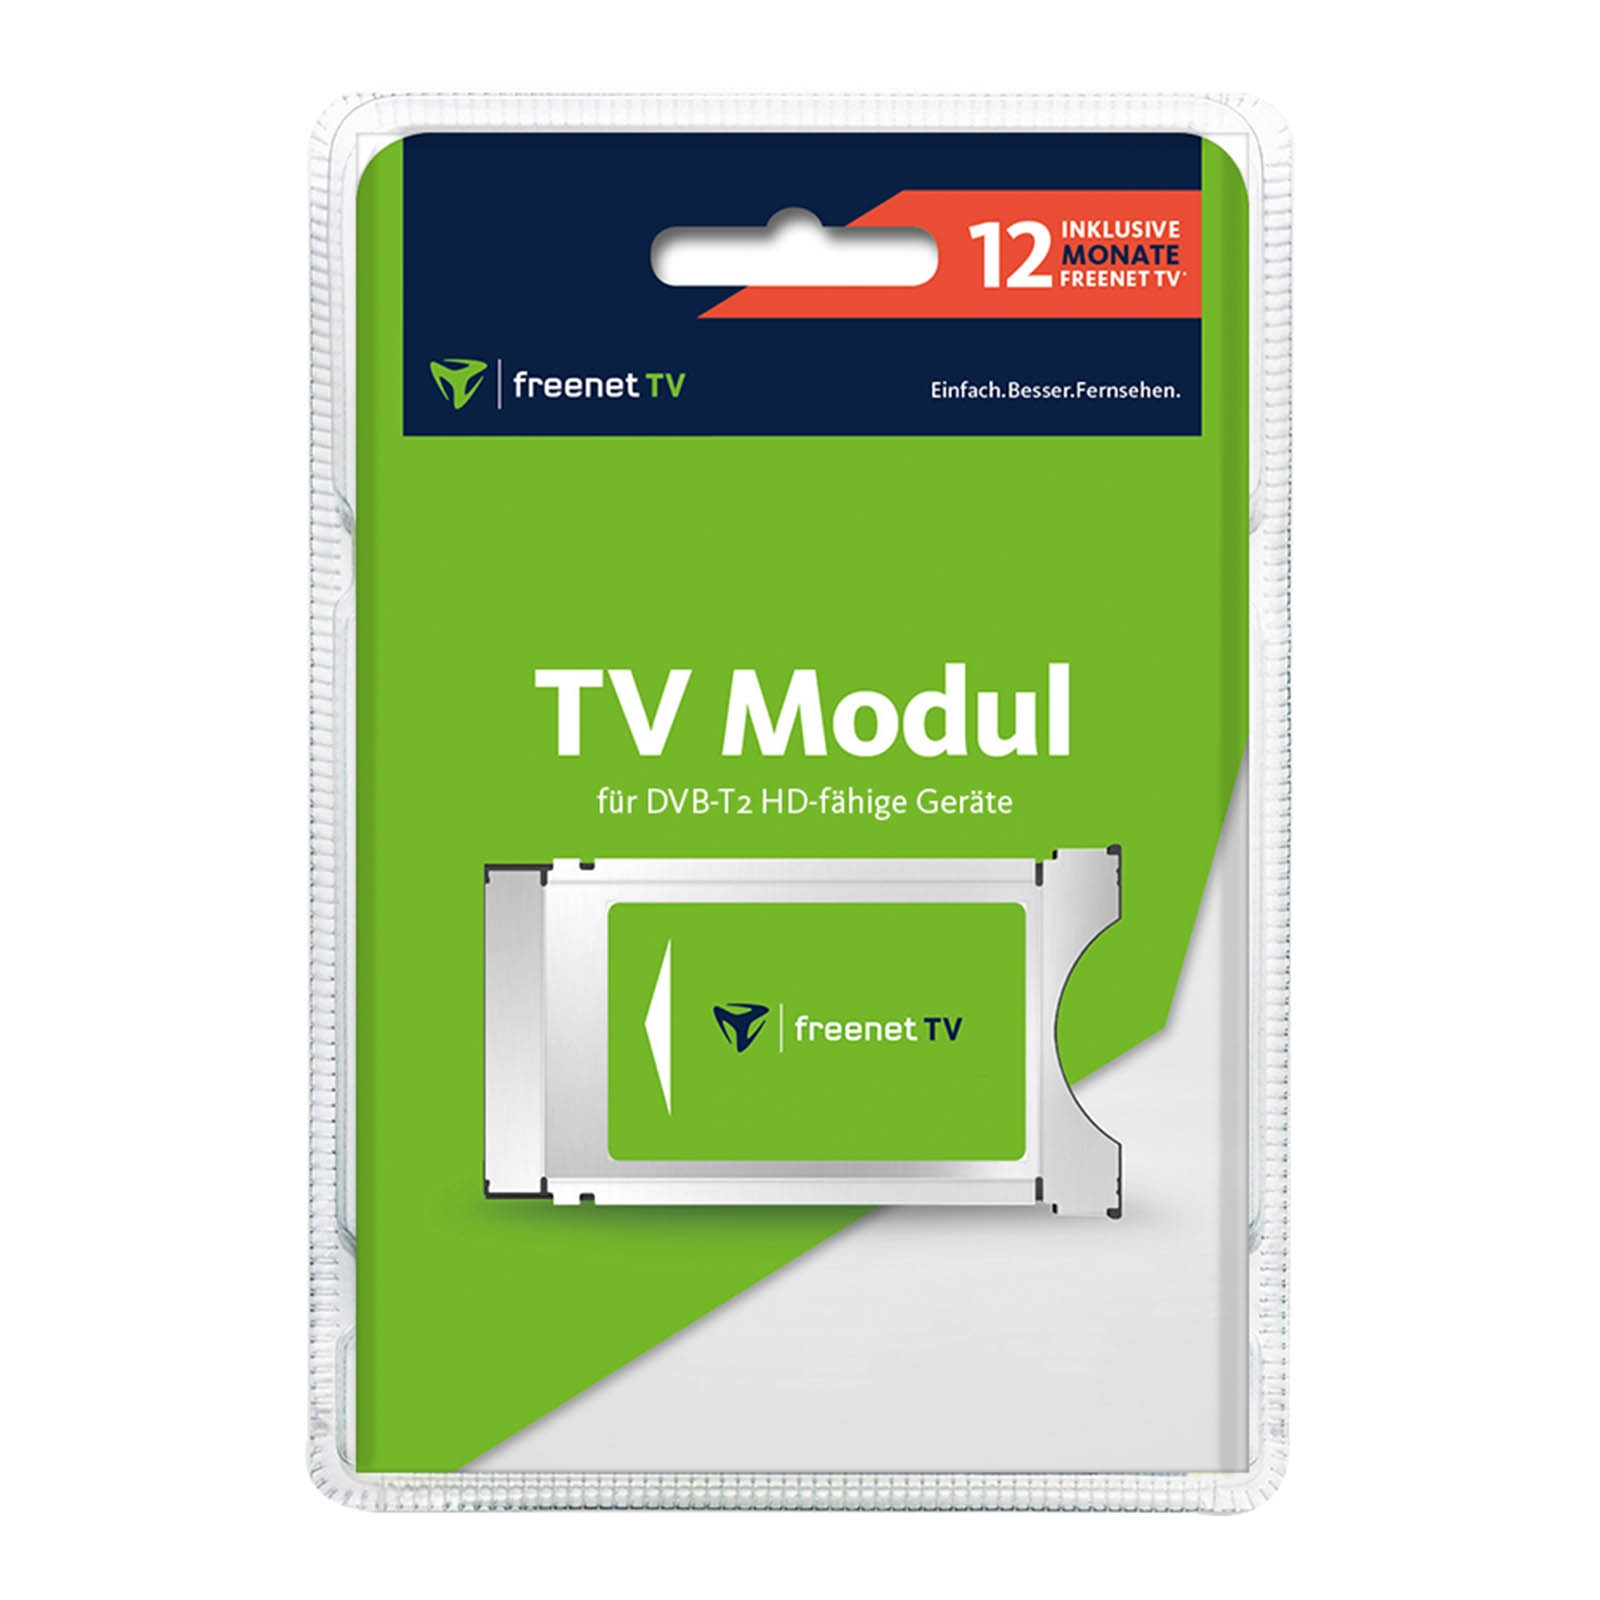 freenet tv hd ci modul f r dvb t2 satellit hd empfang 12 monate ebay. Black Bedroom Furniture Sets. Home Design Ideas